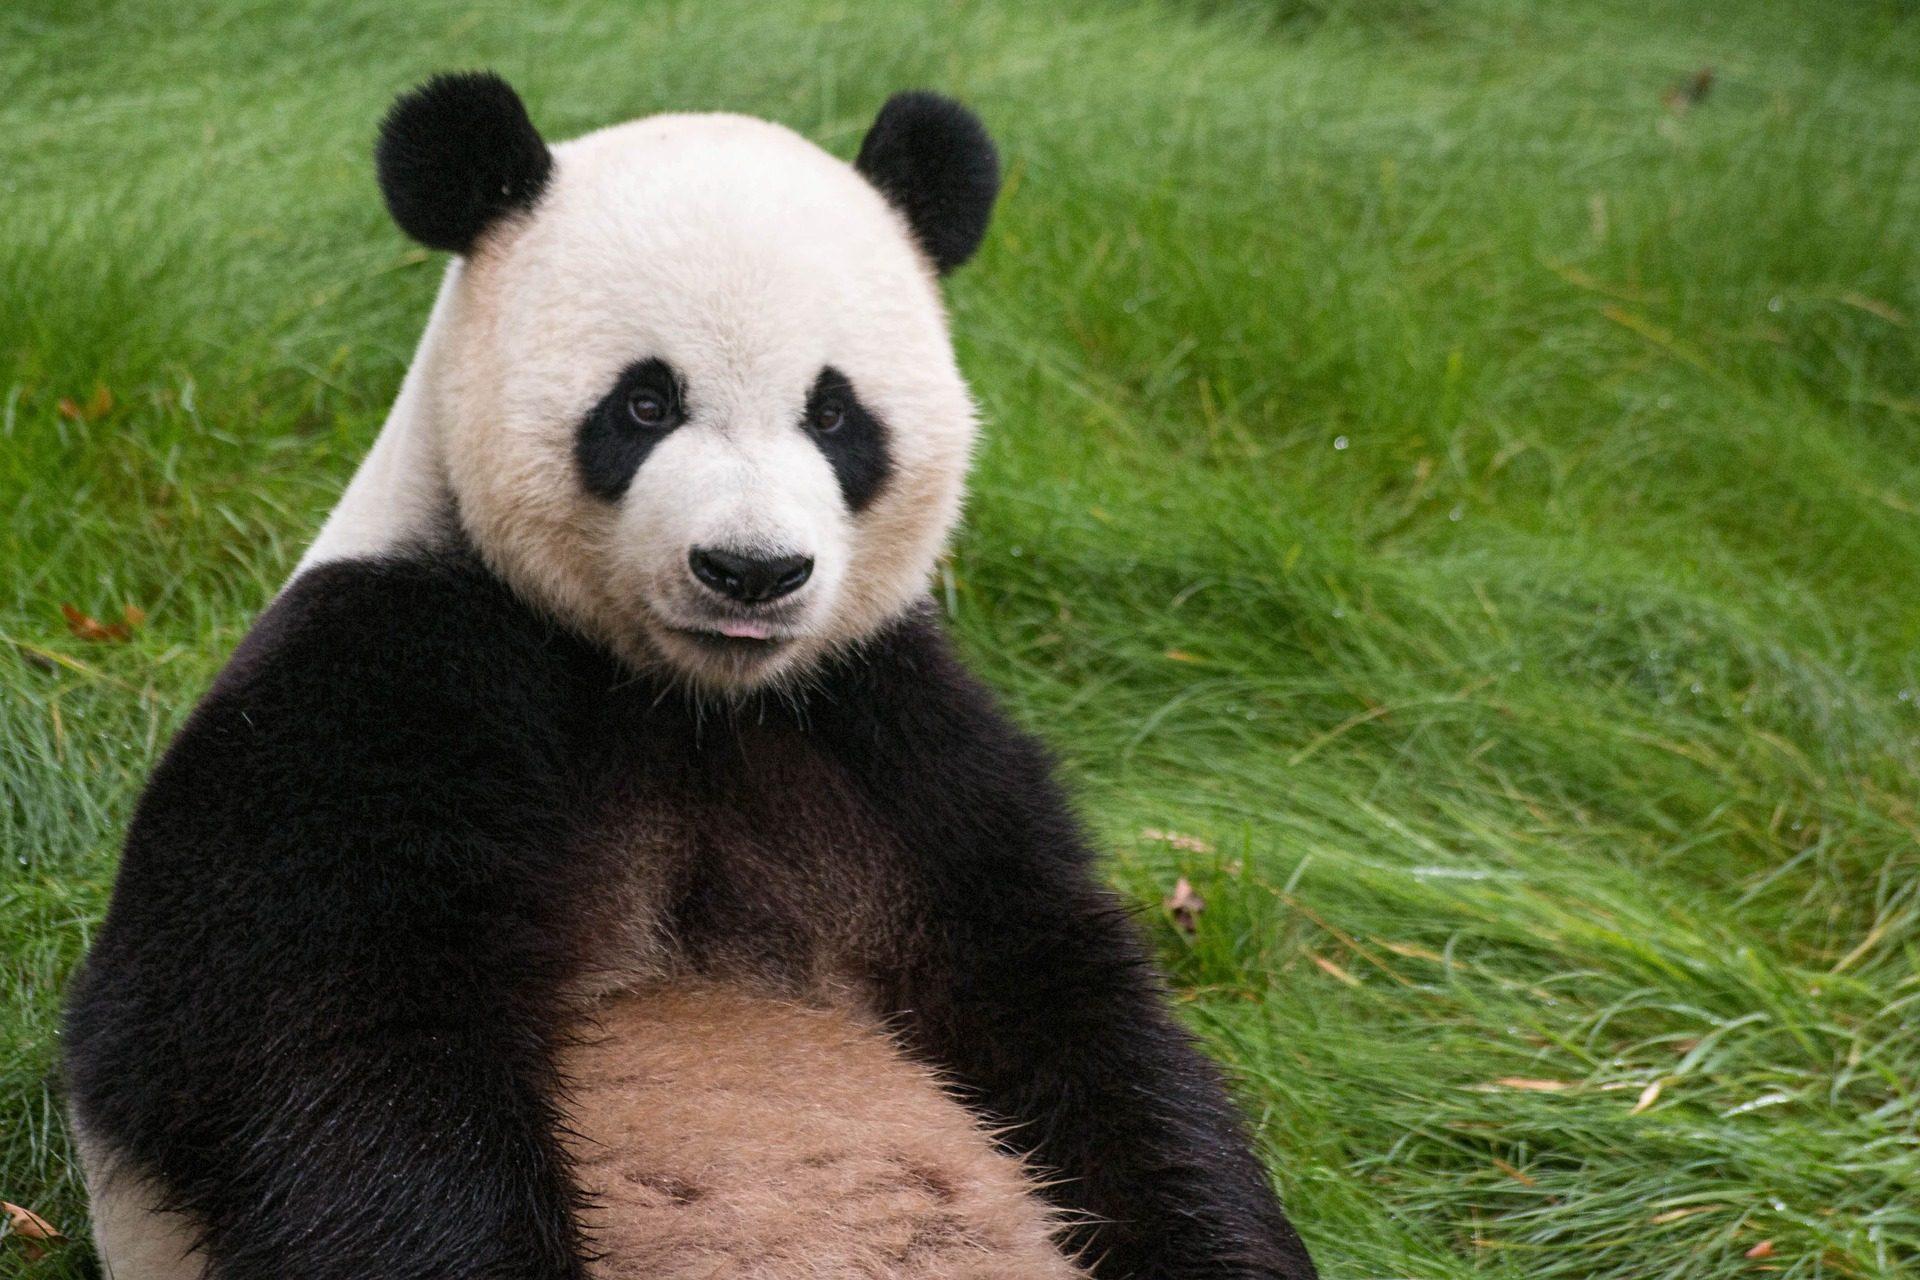 ours, Panda, fourrure, coup d'oeil, Zoo, herbe - Fonds d'écran HD - Professor-falken.com